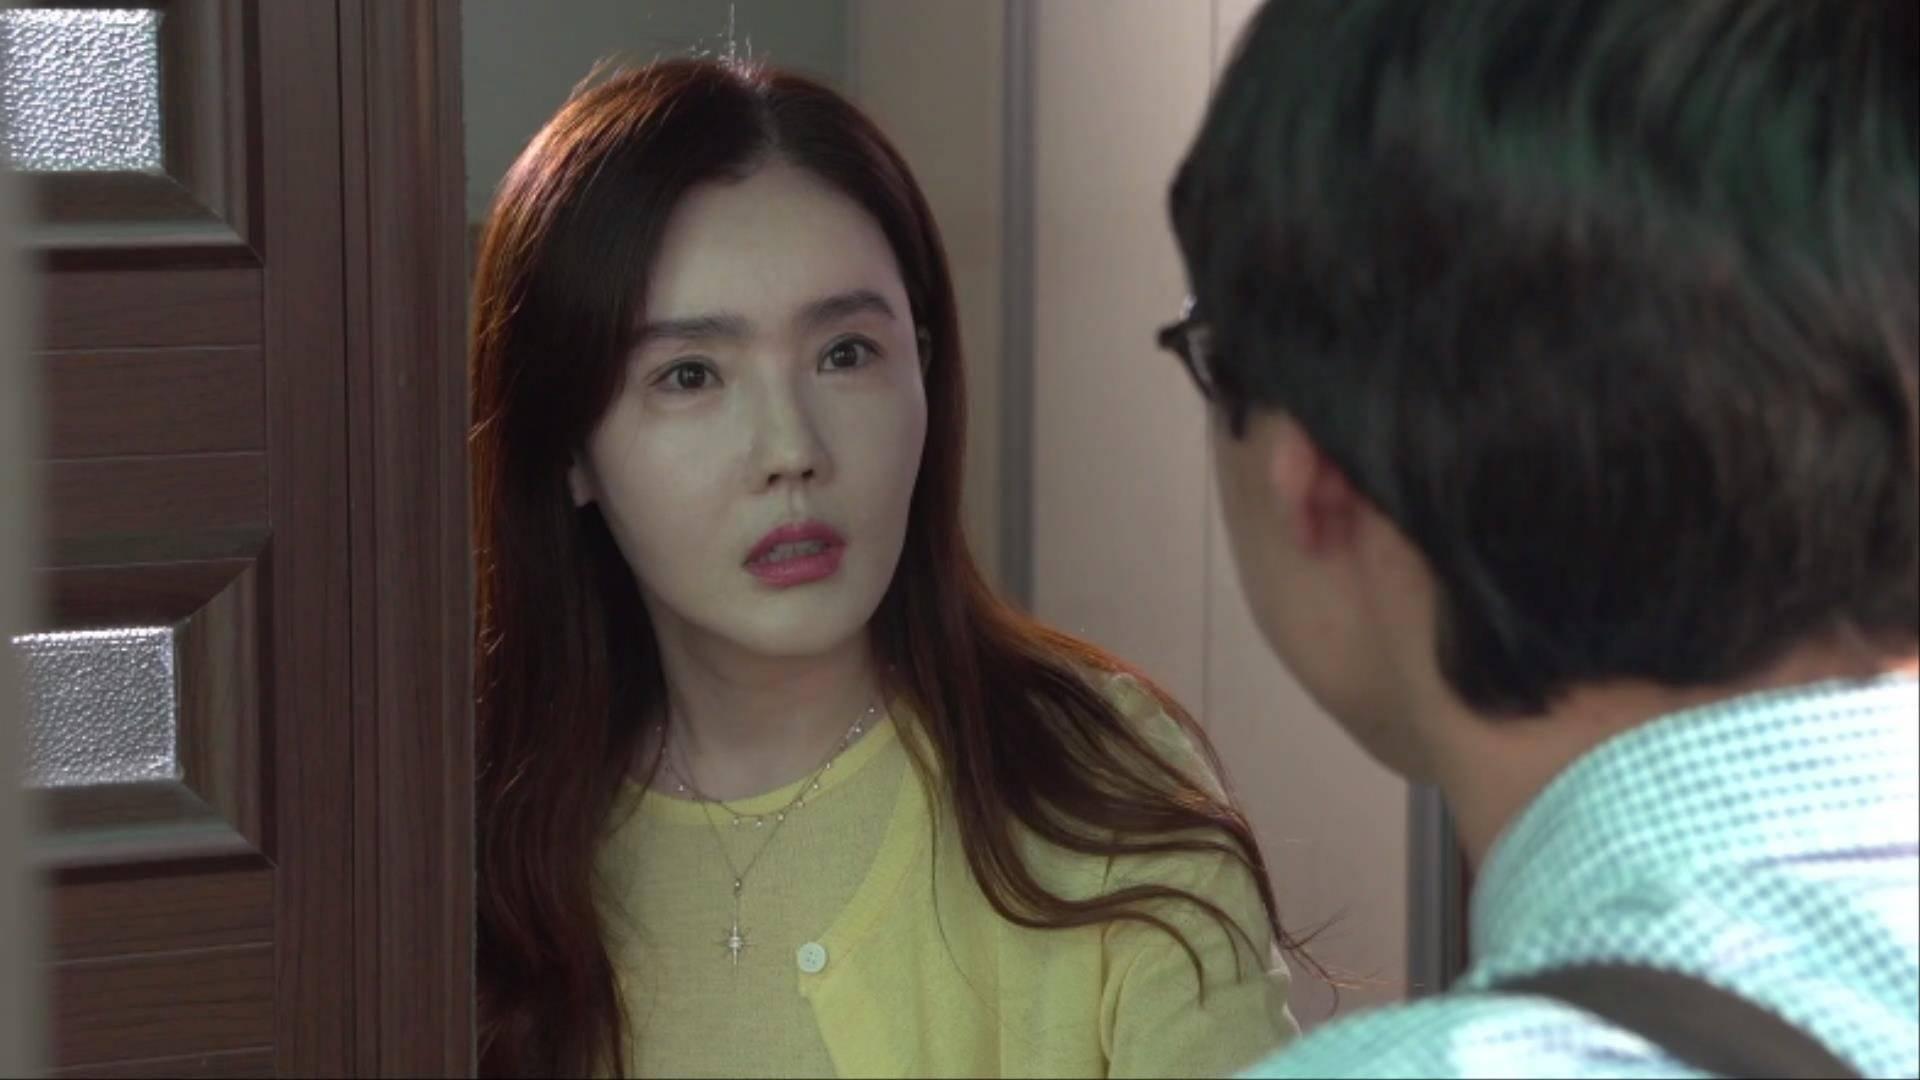 Secret Love My Friend S Mom Korean Movie 2018 밀애 친구